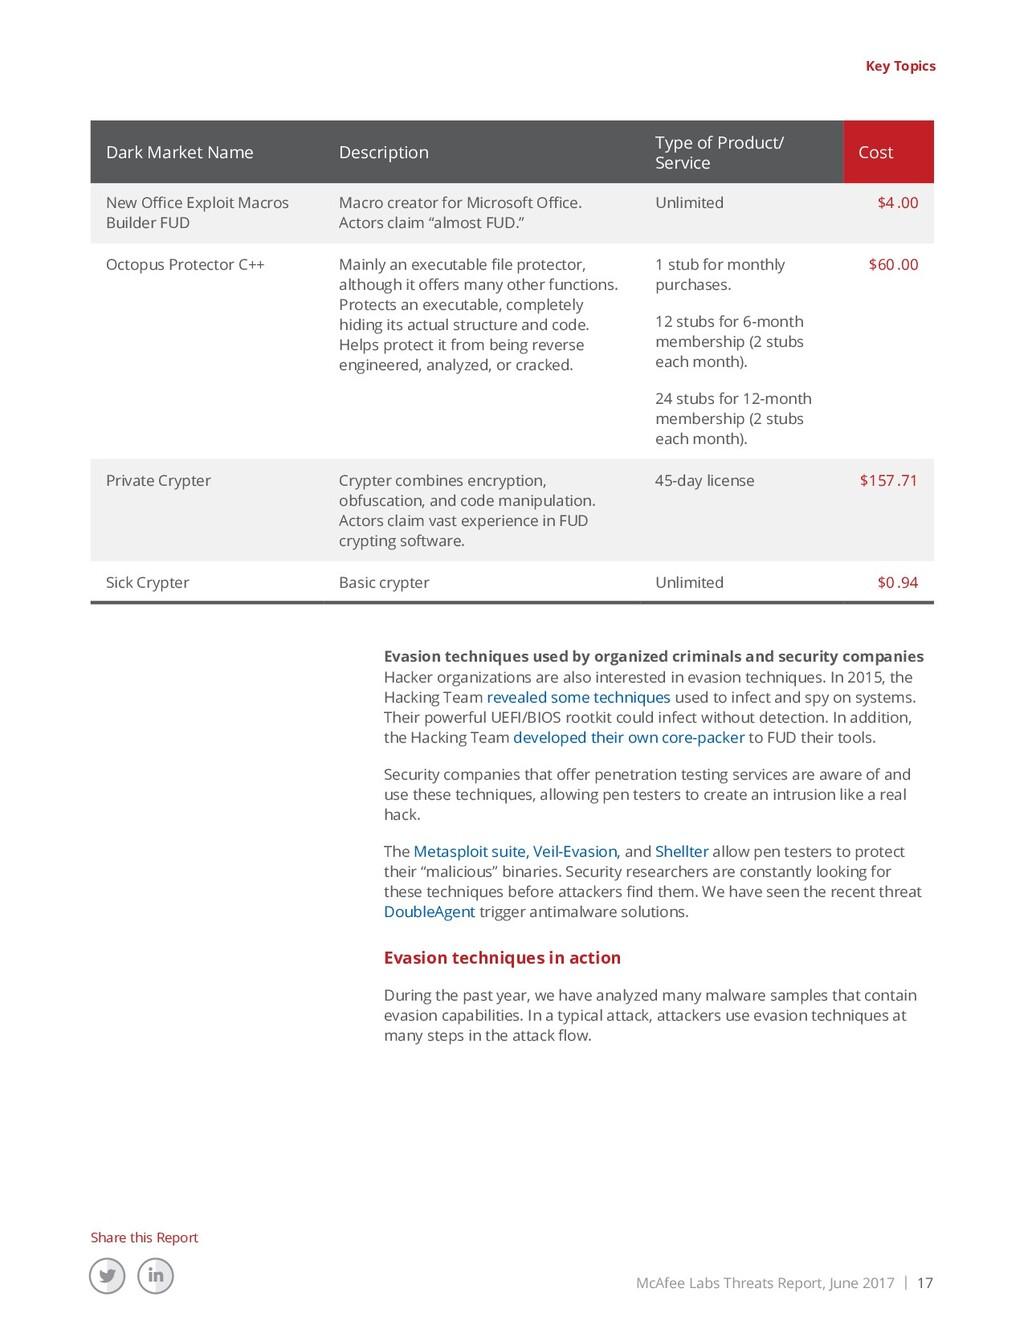 McAfee Labs Threats Report, June 2017 | 17 Shar...